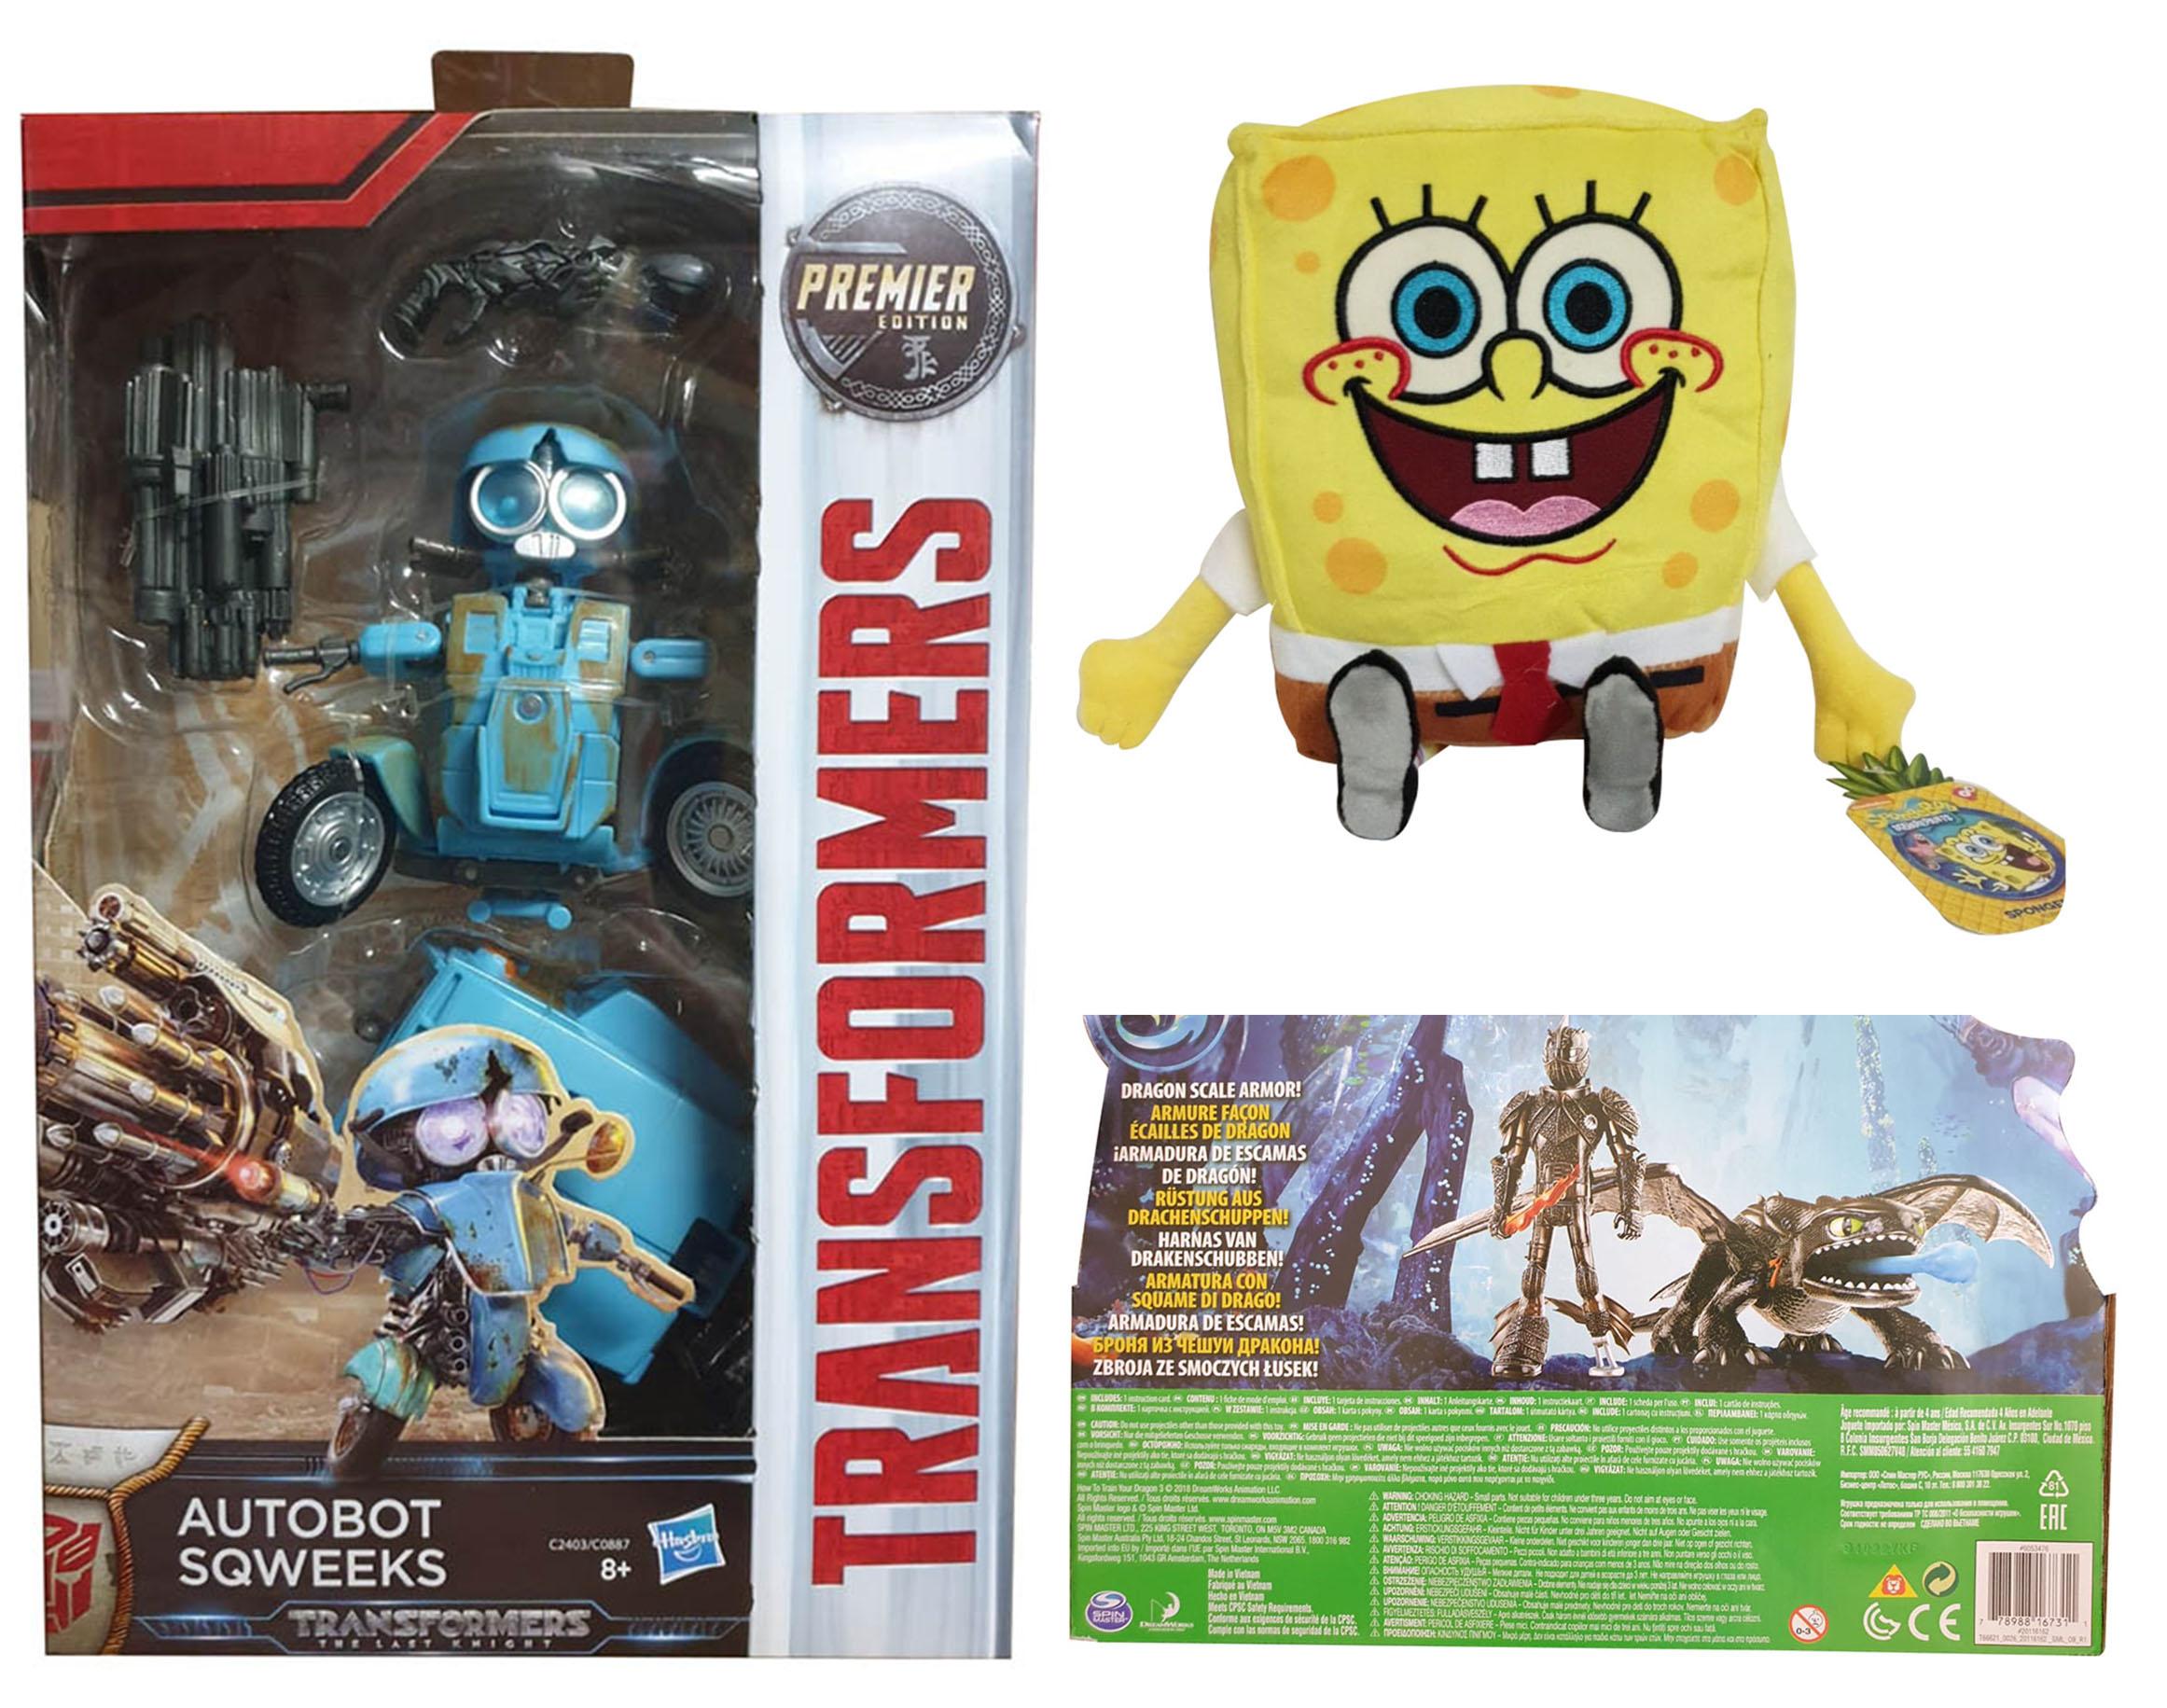 Hasbro Transformers C2403ES1 Autobot Sqweeks Spongebob Schwamkopf Ohnezahn Hicks